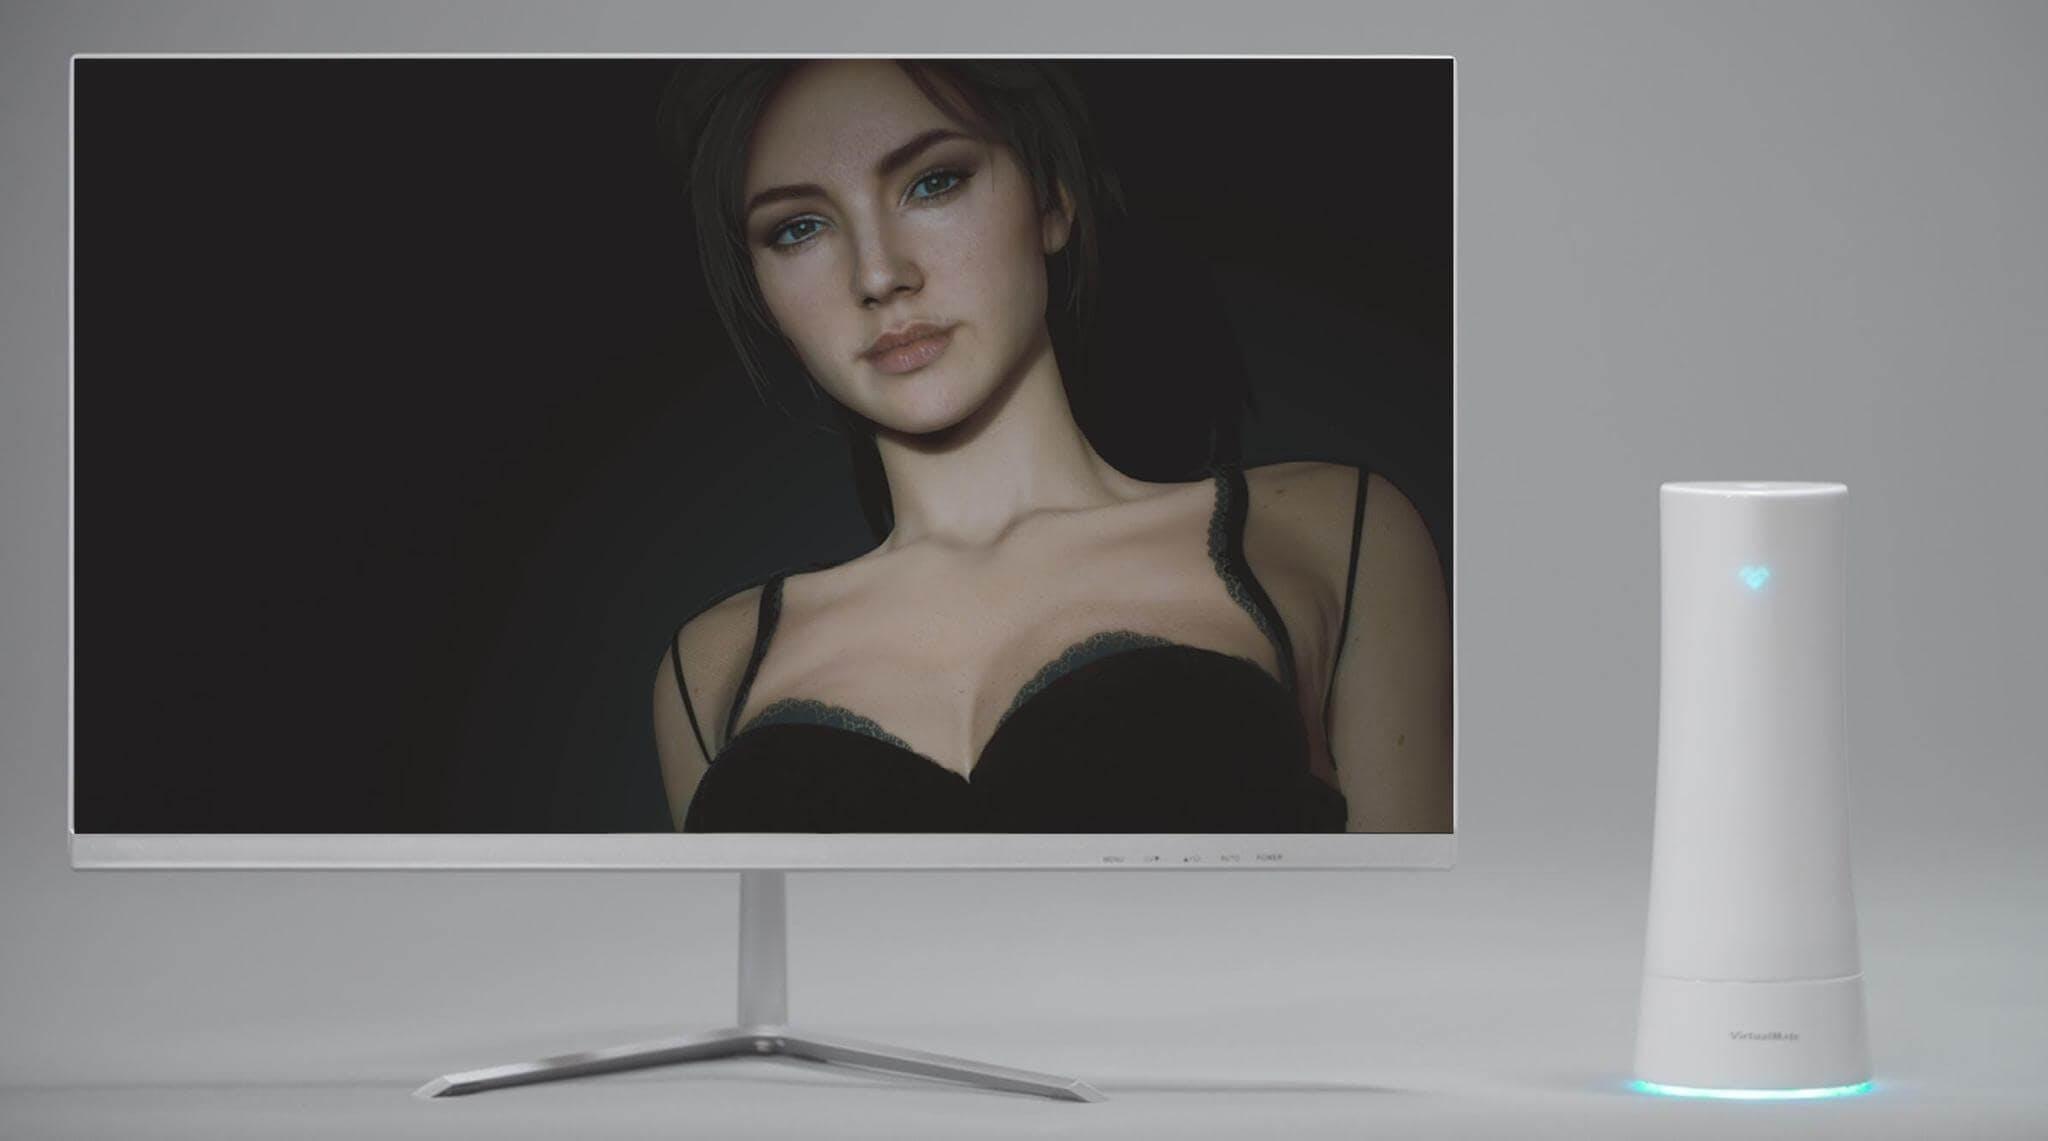 Virtual Mate VR Sex virtual sex